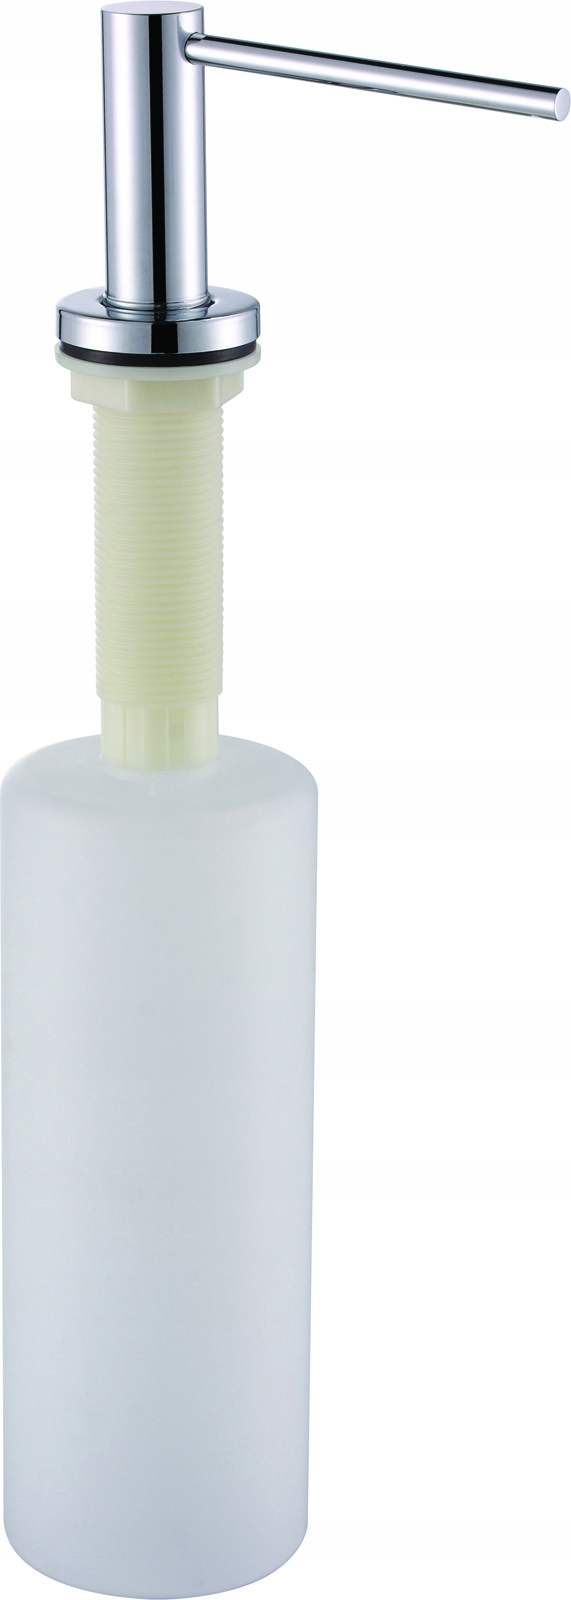 Dozownik do płynu Kernau KSD 02 Chrome 500 ml